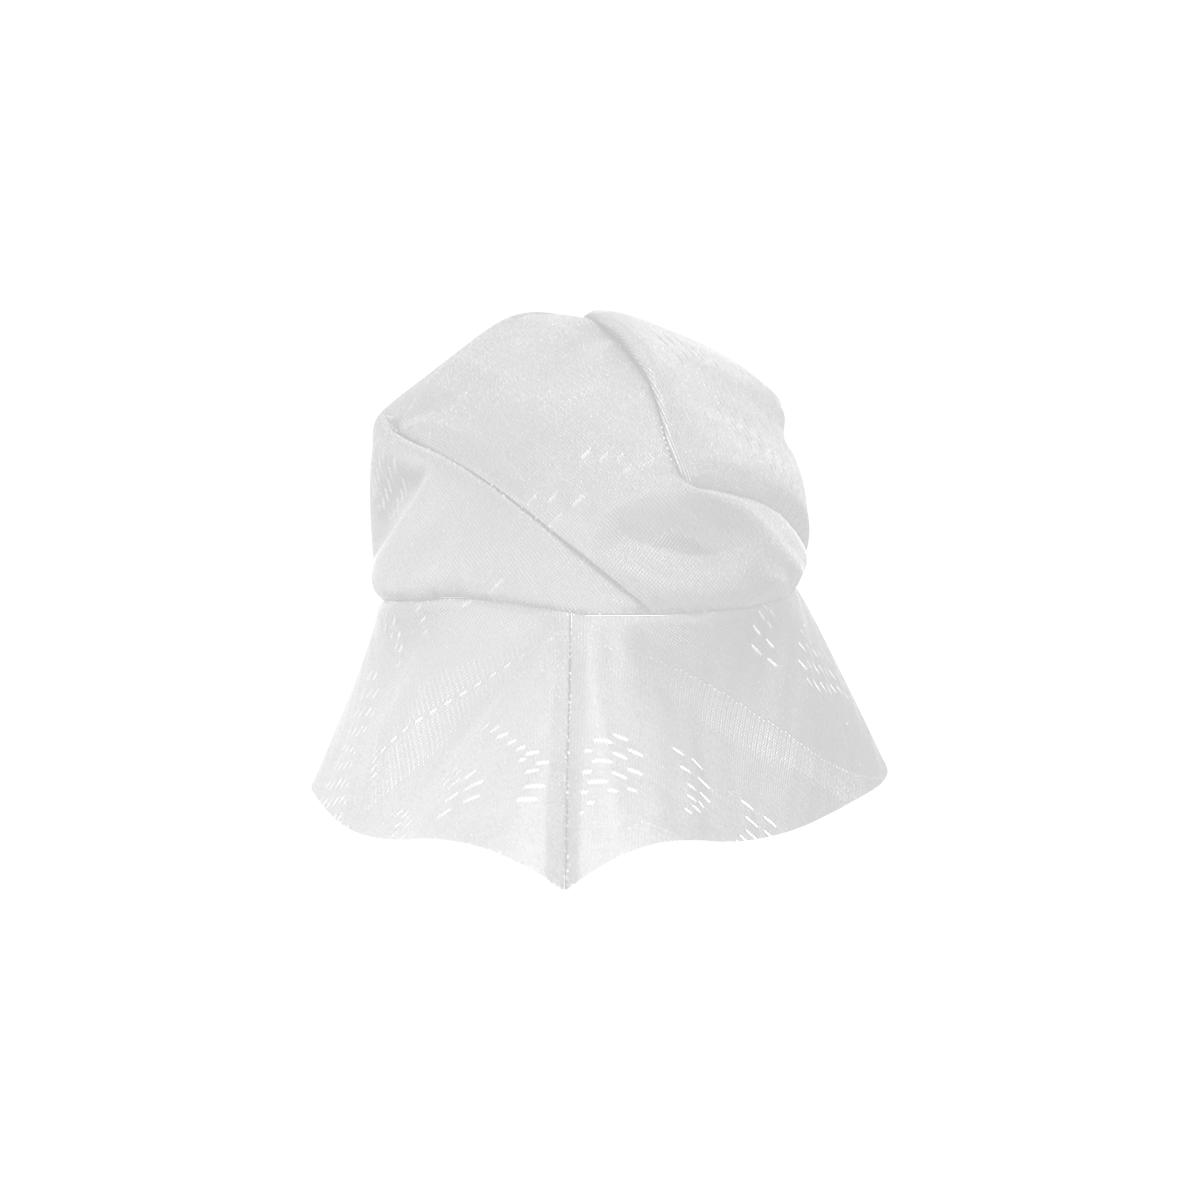 New Style Bucket Hat